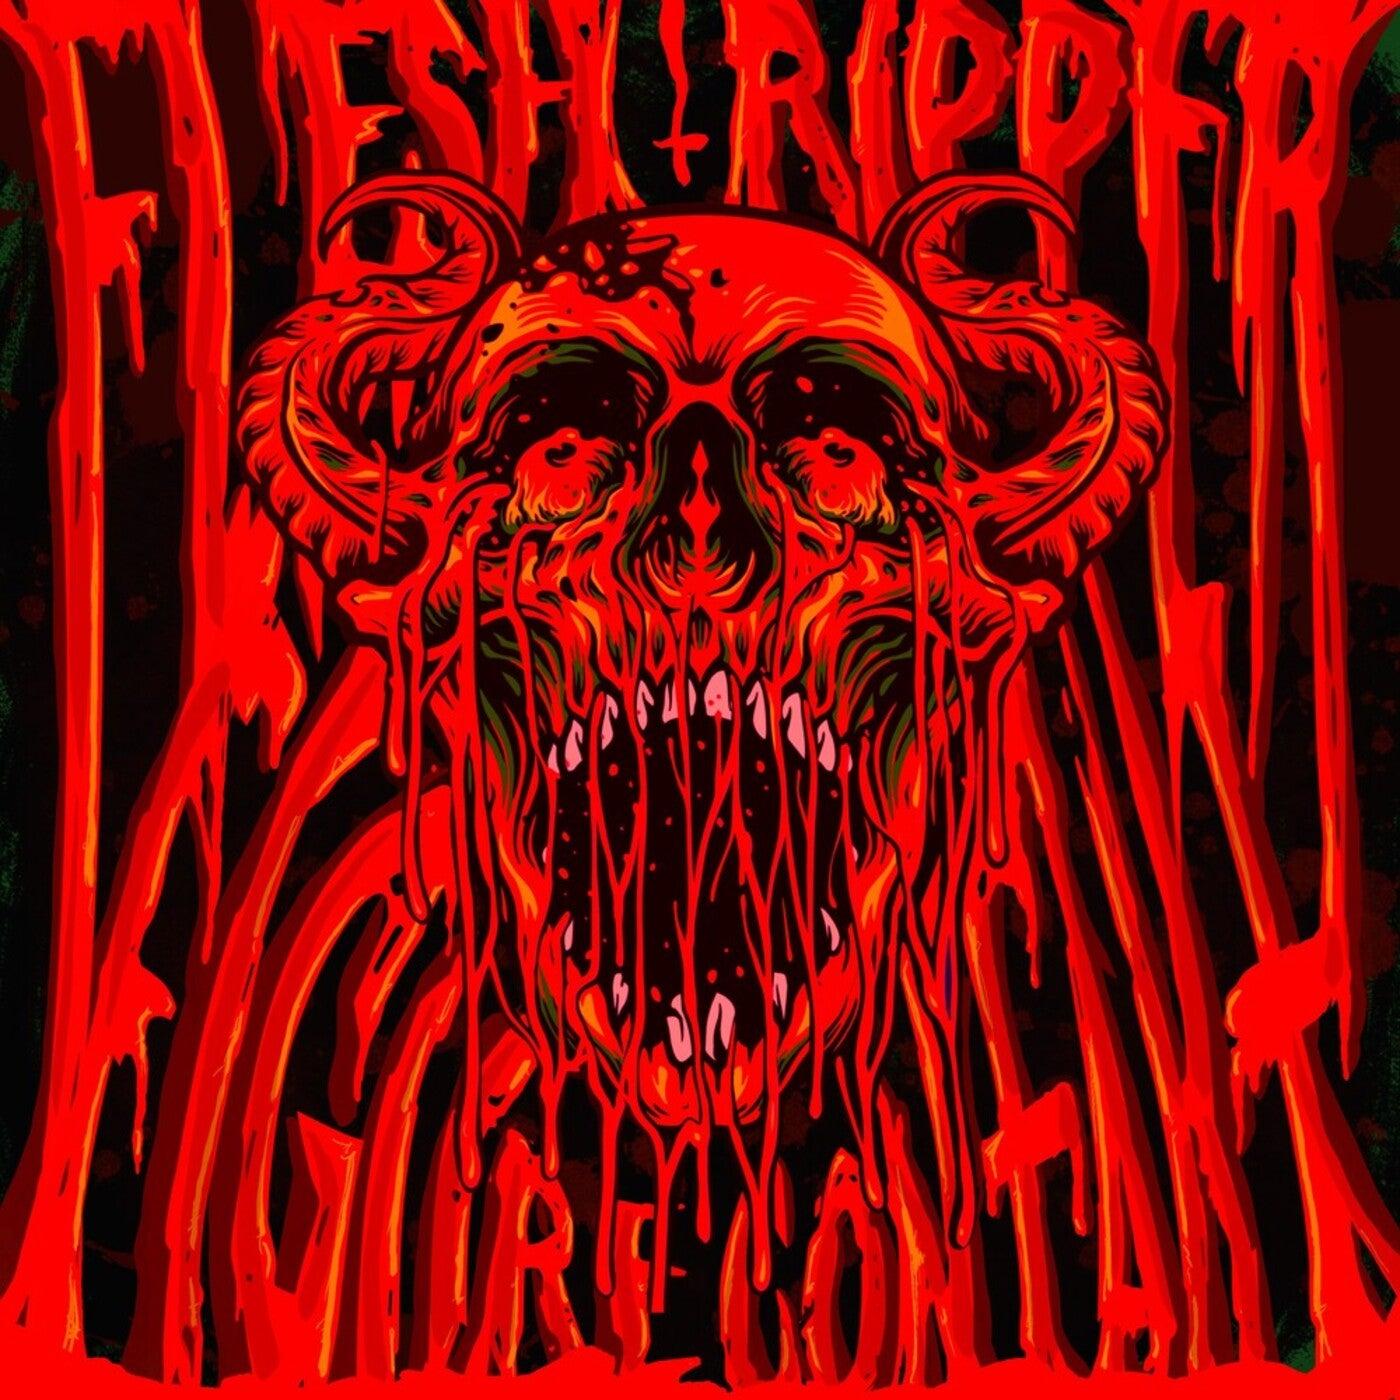 Flesh Ripper (Original Mix)